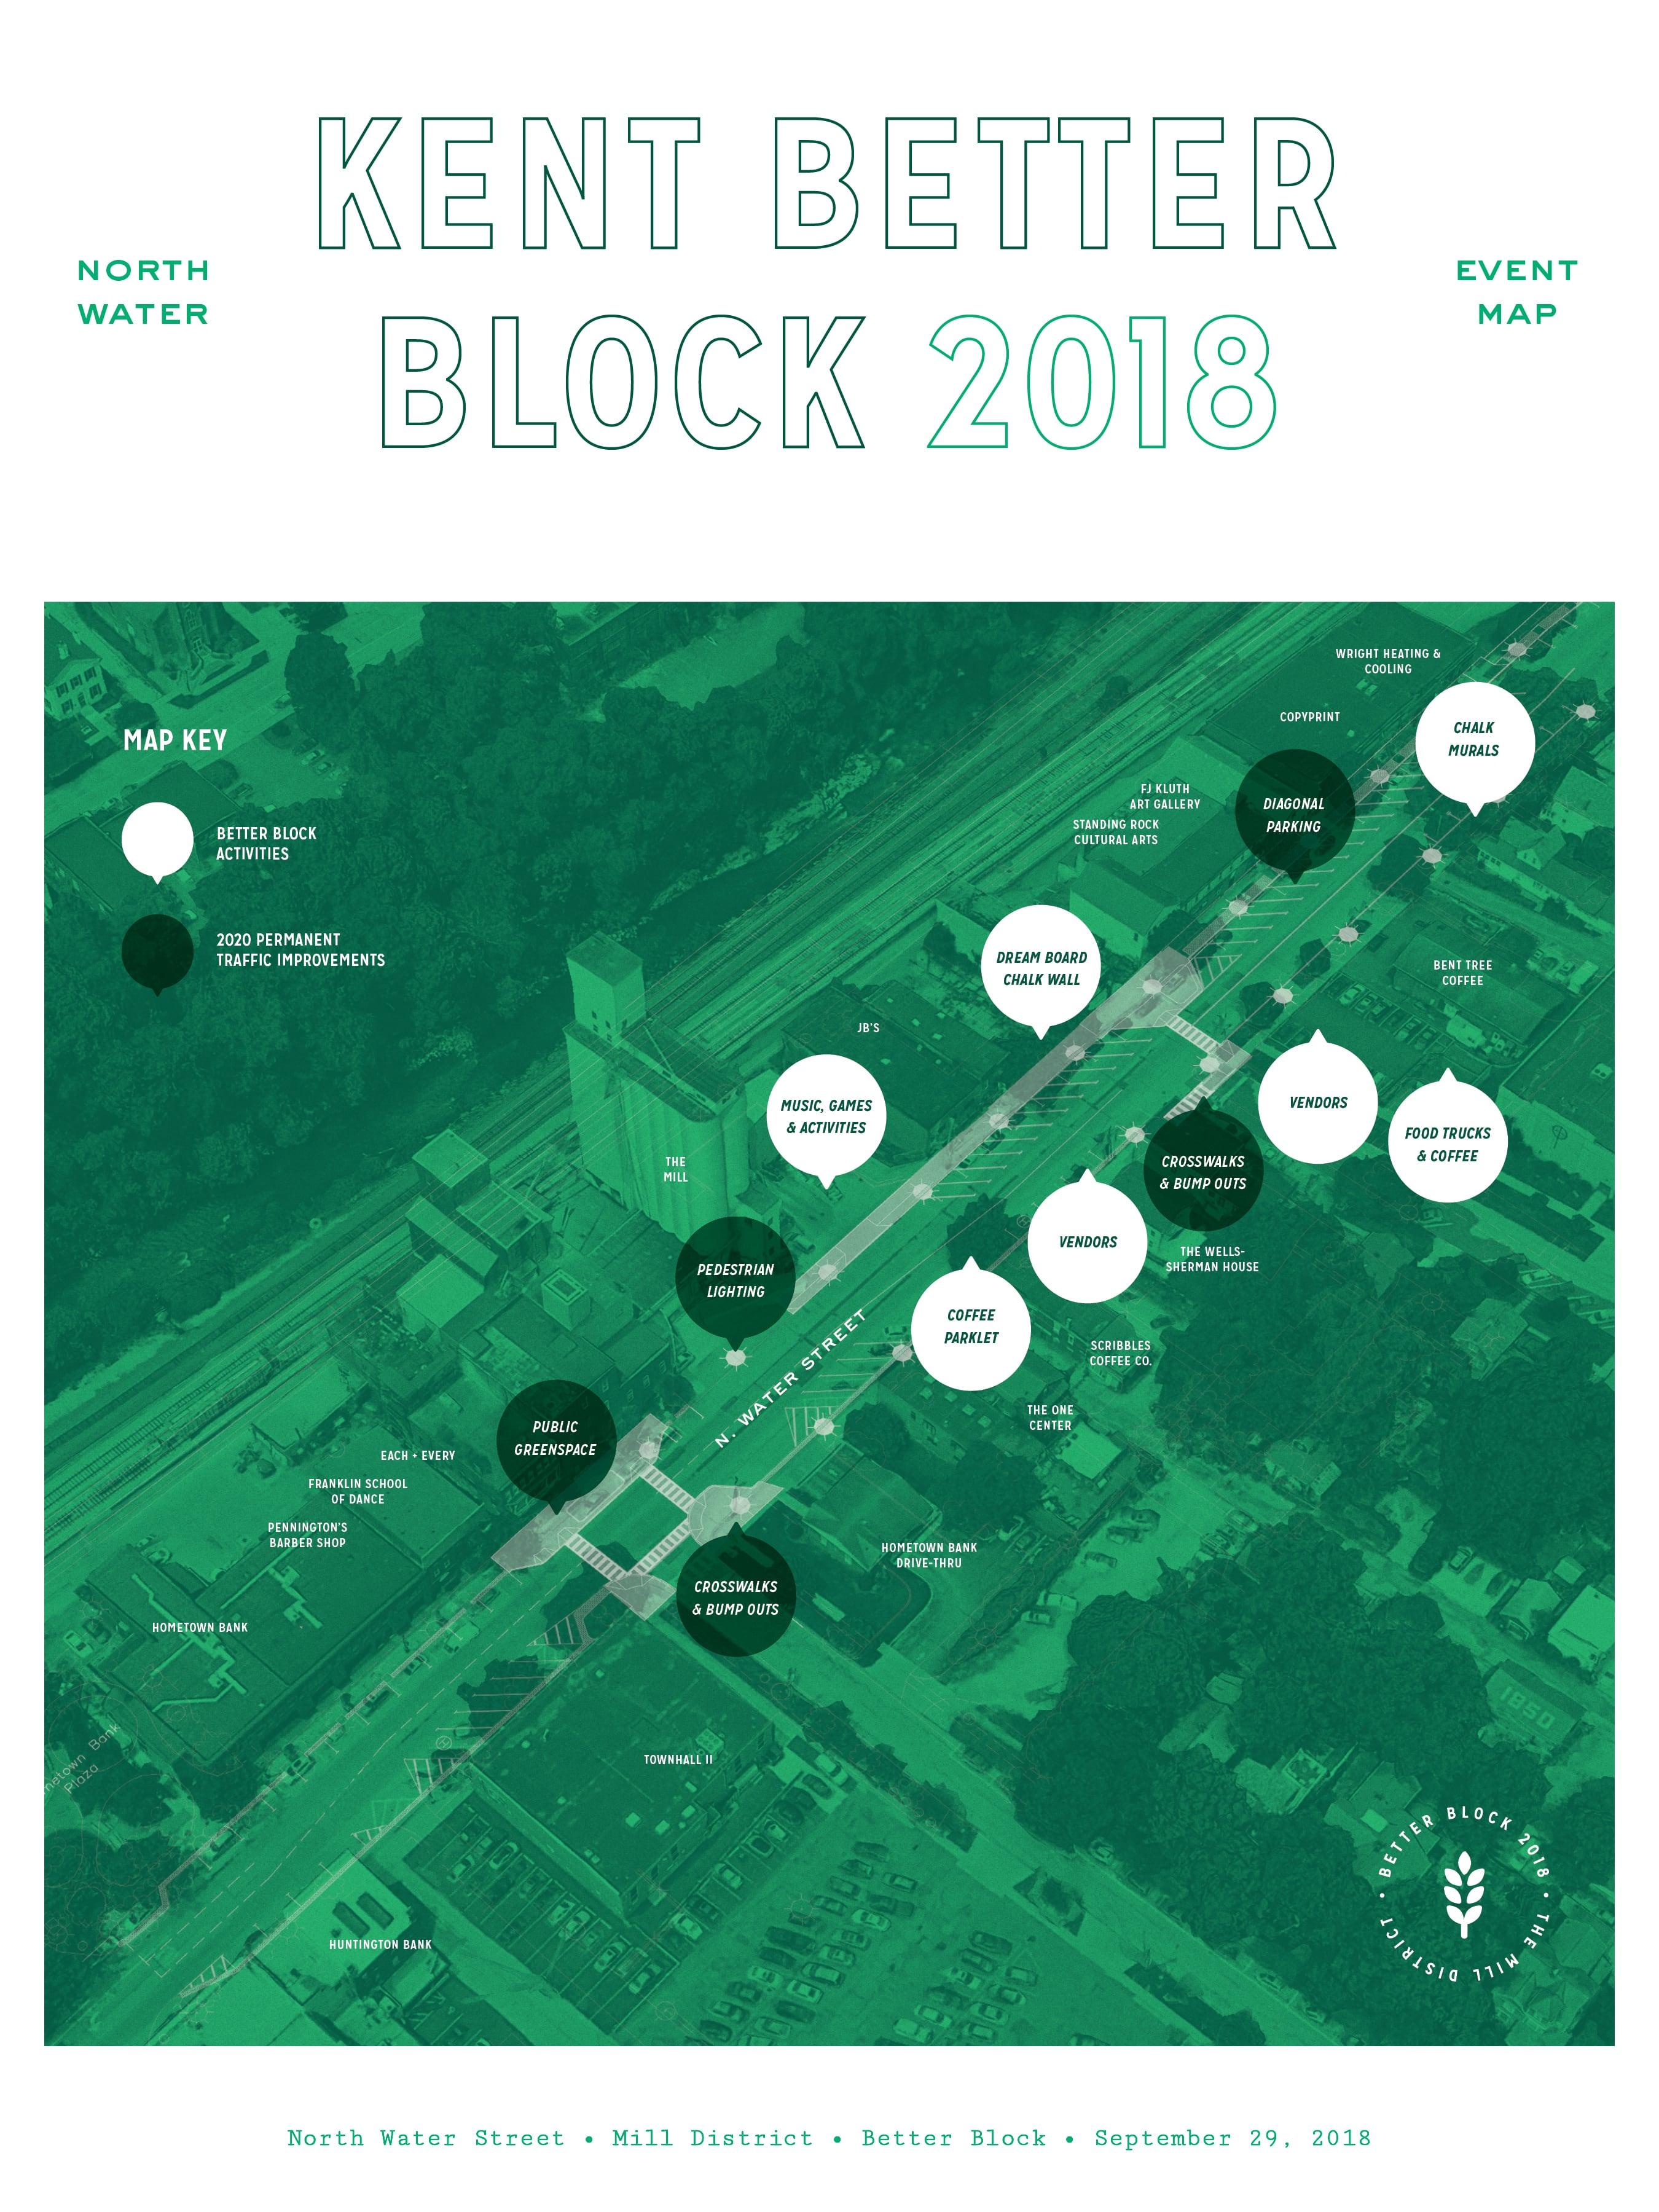 CK_MillDistrict-BetterBlockMap-v4.3_ForWebsite_Map